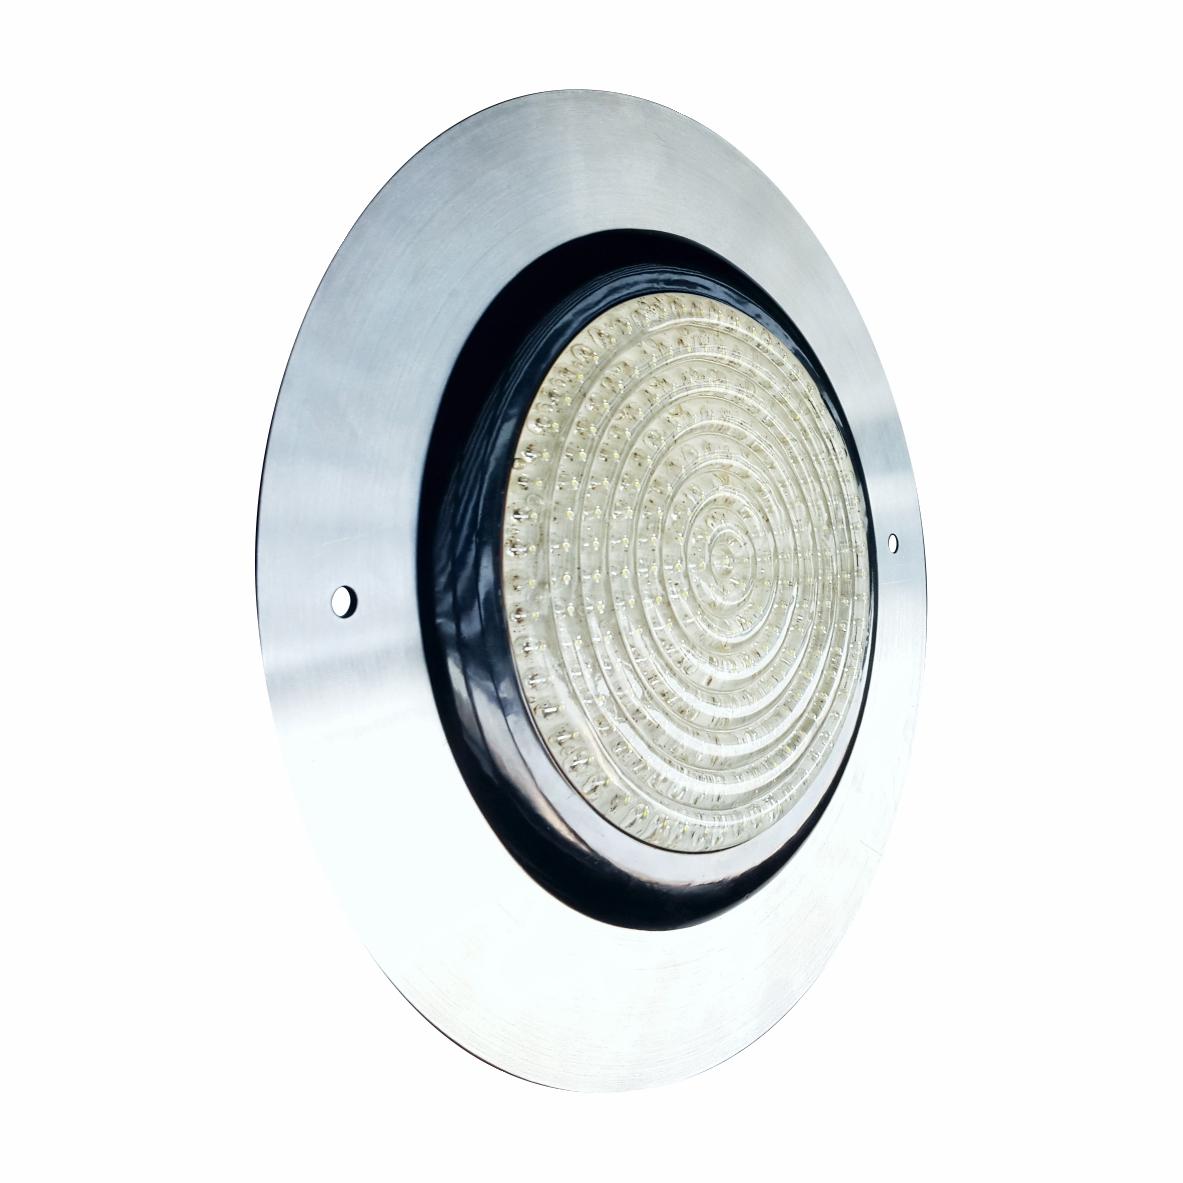 Picture of چراغ روکار استخری فوق باریک استیل 10 وات برند LEDMAN